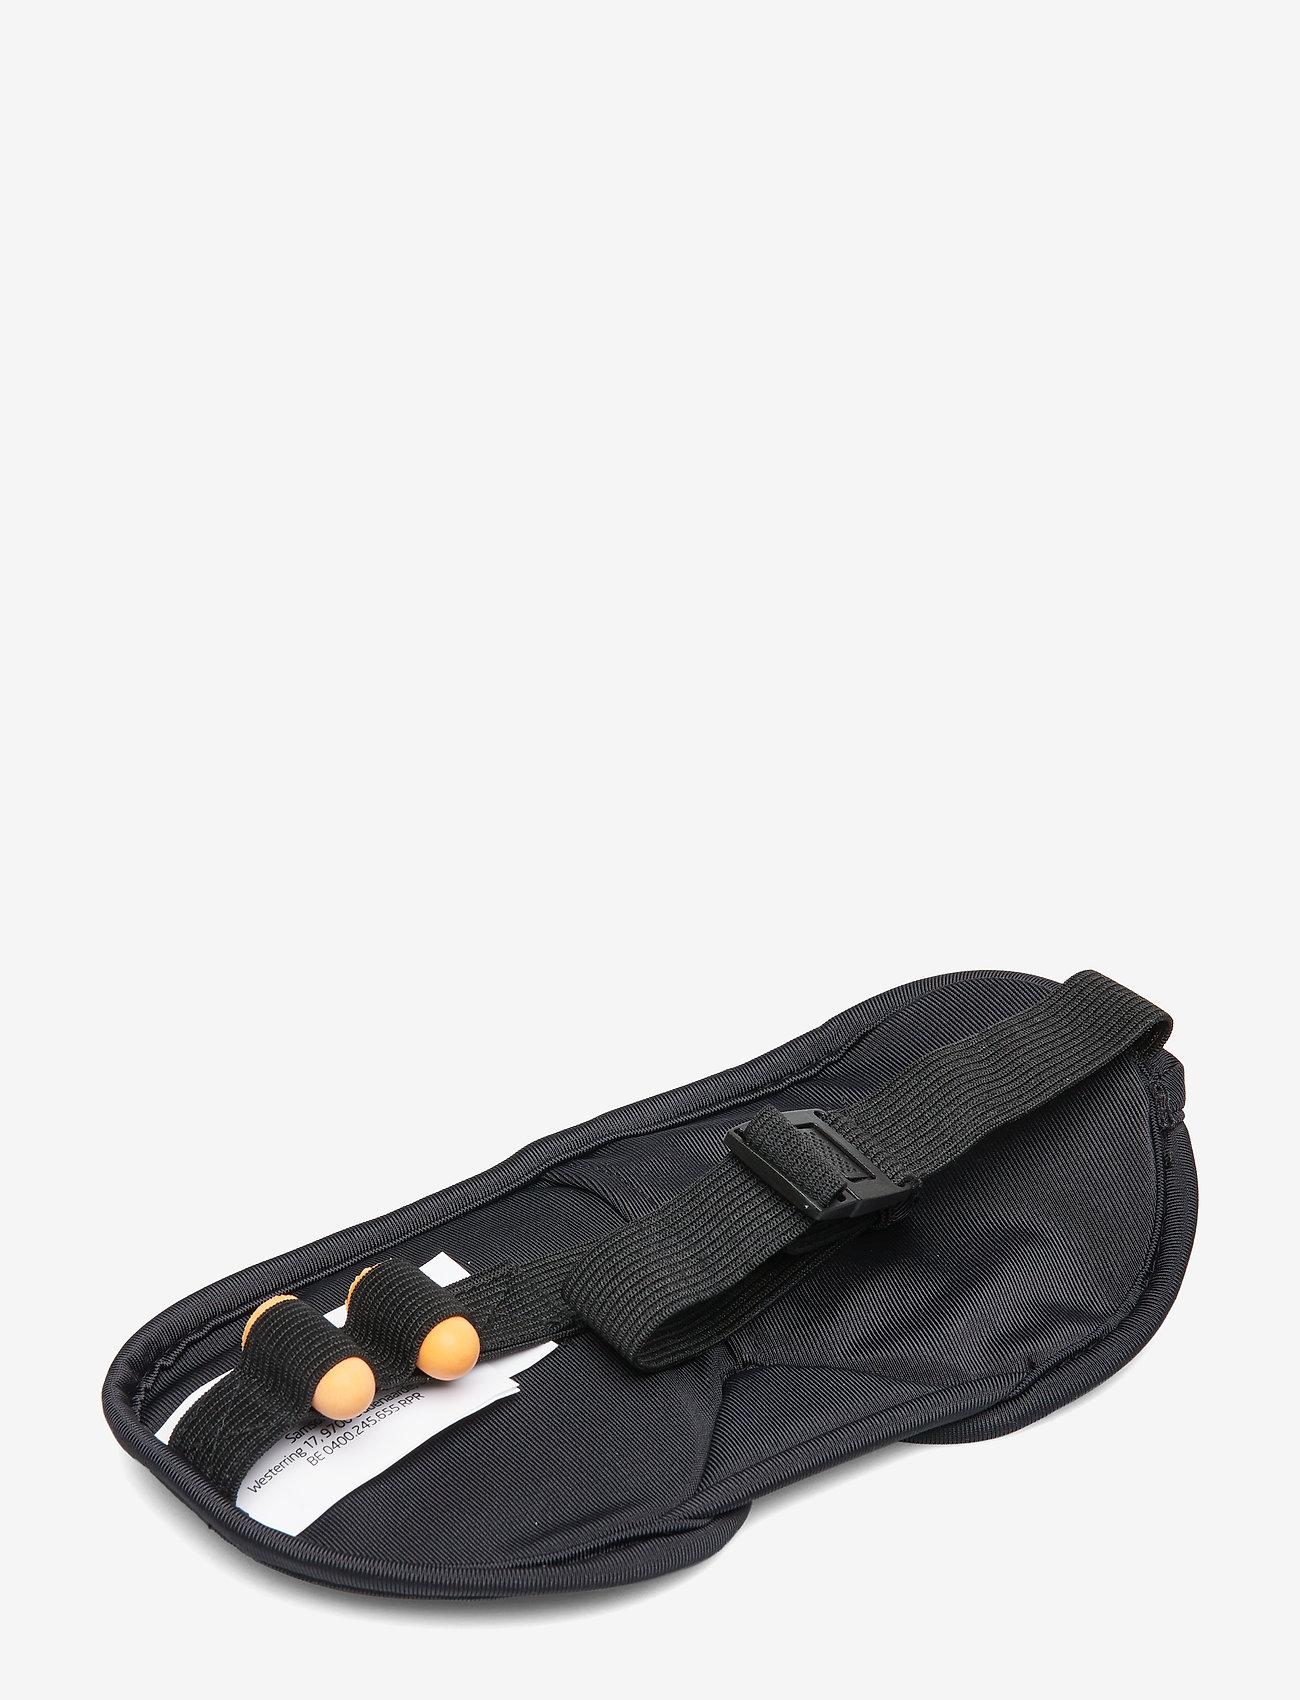 Samsonite - Comfort Travelling Eye Mask And Earplugs - reisartikelen - black - 1